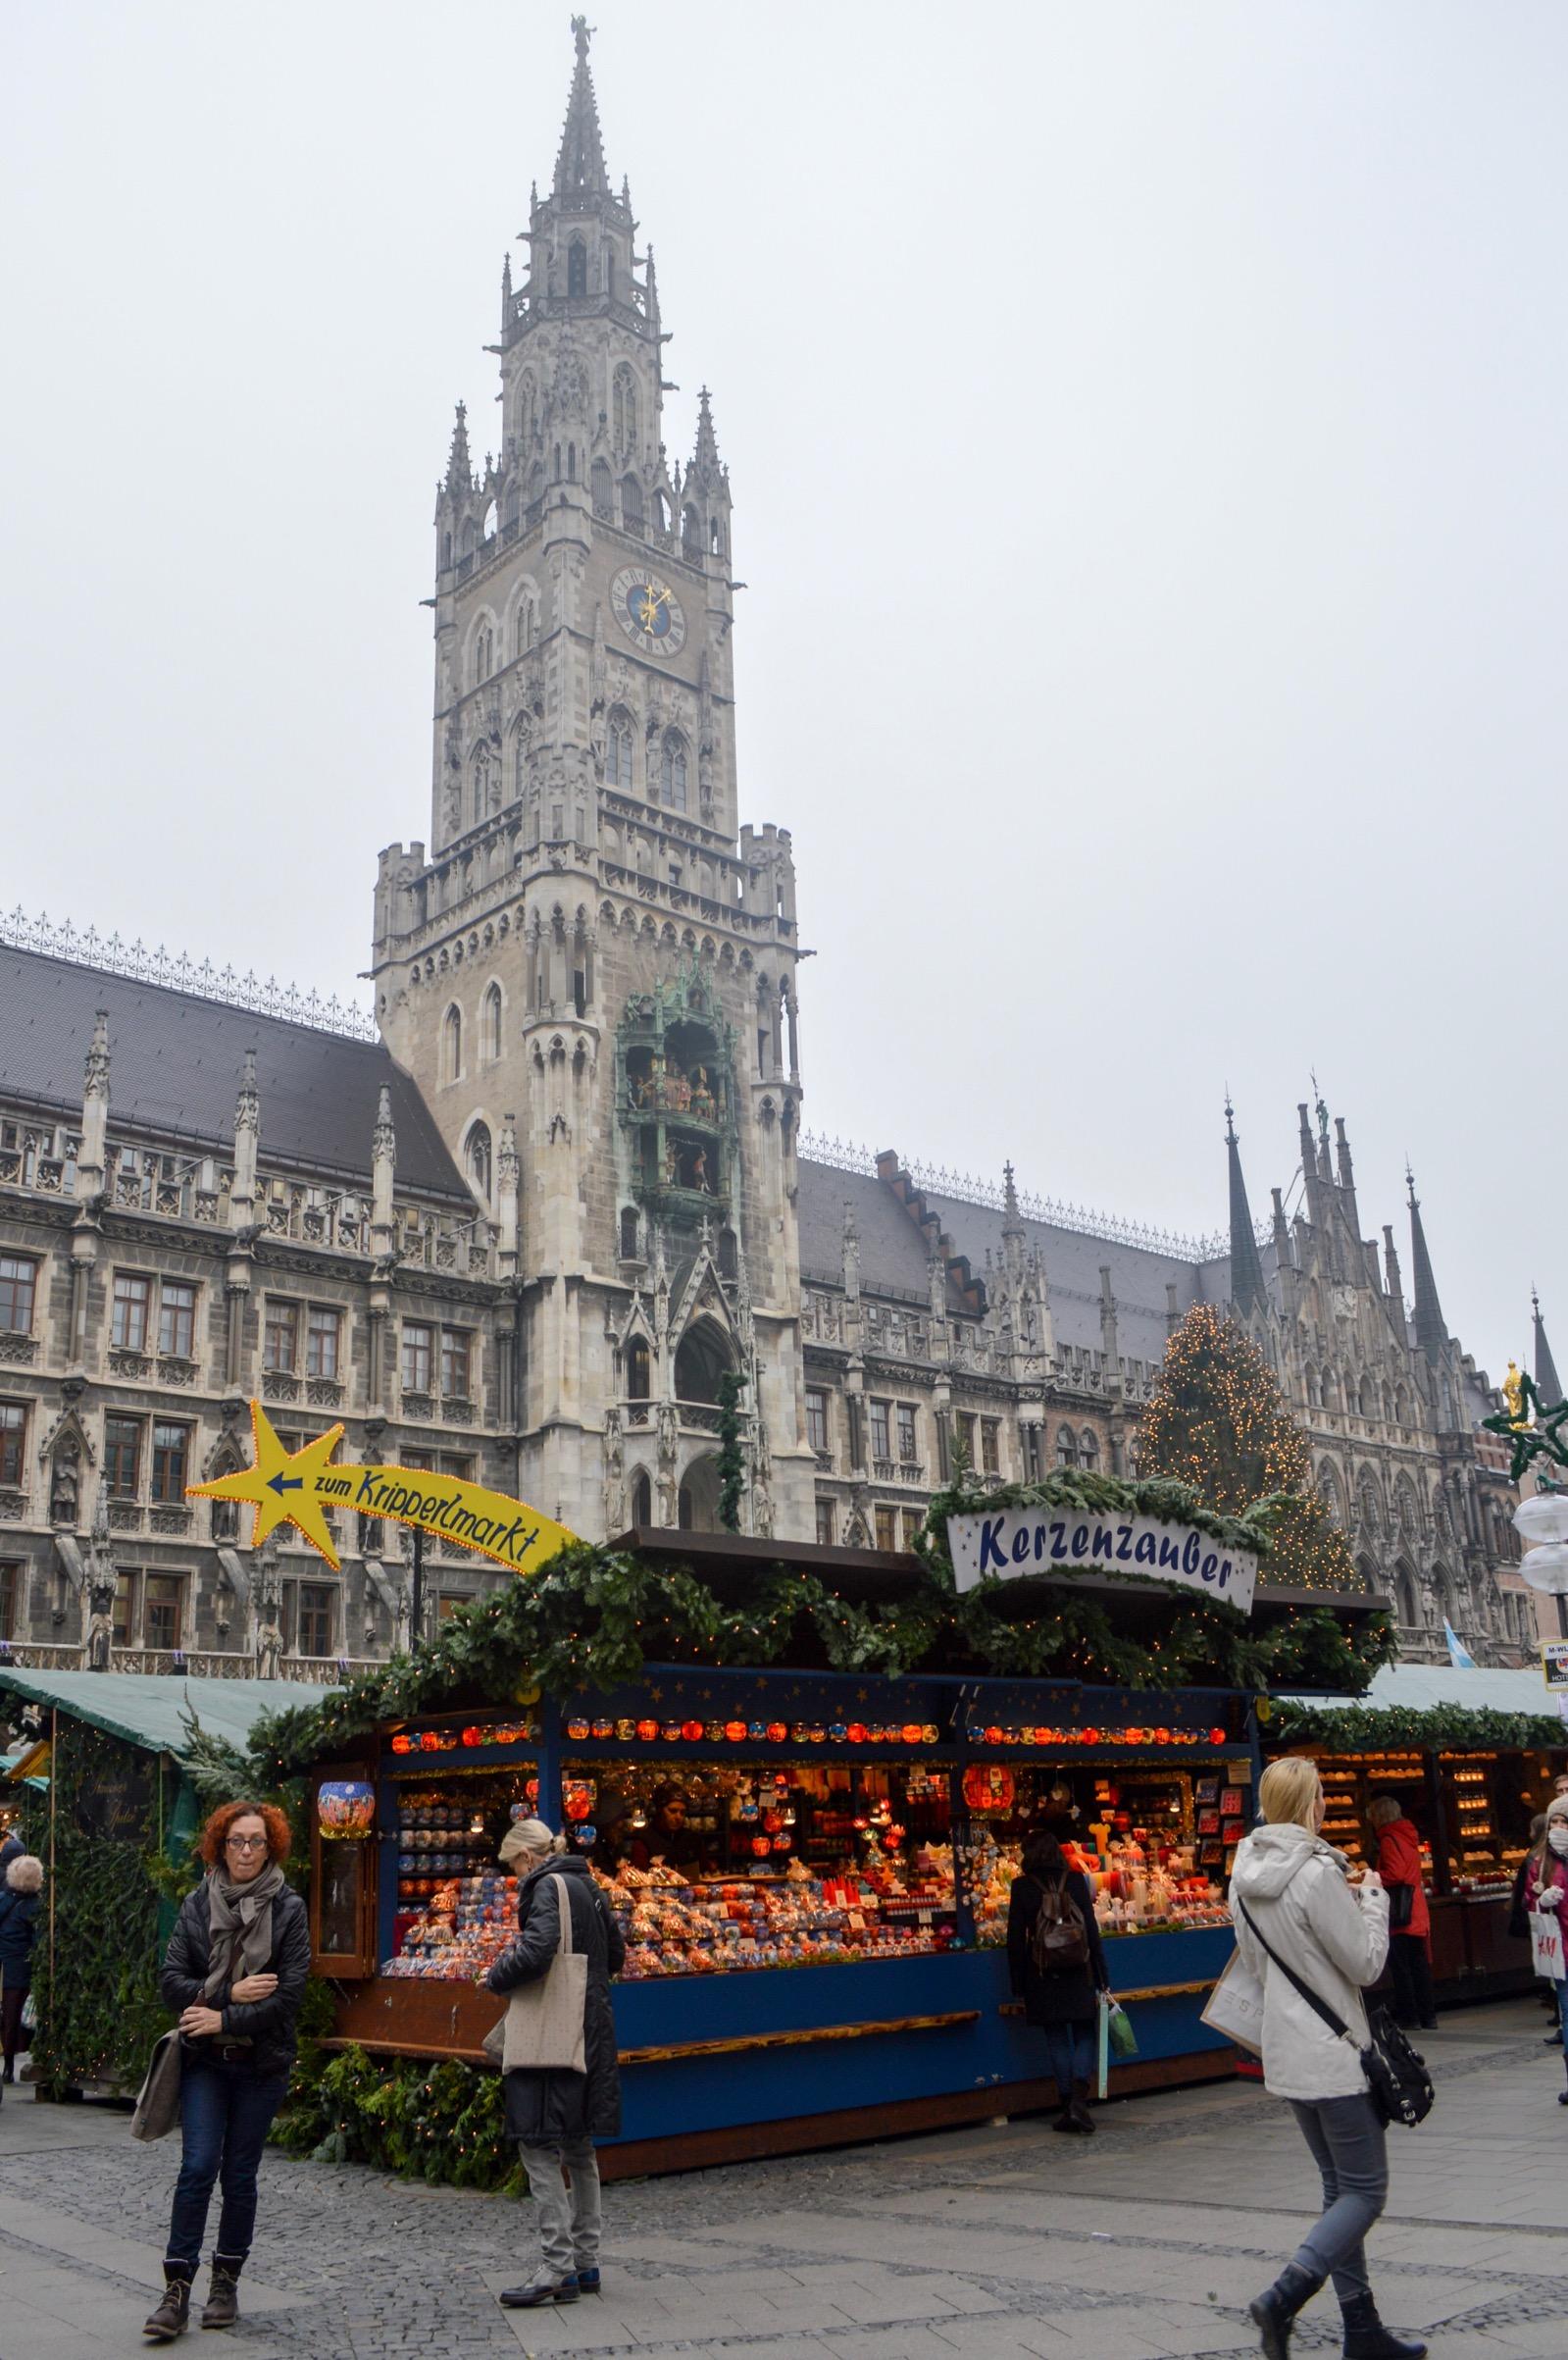 Christmas Market, Marienplatz, Munich, Germany